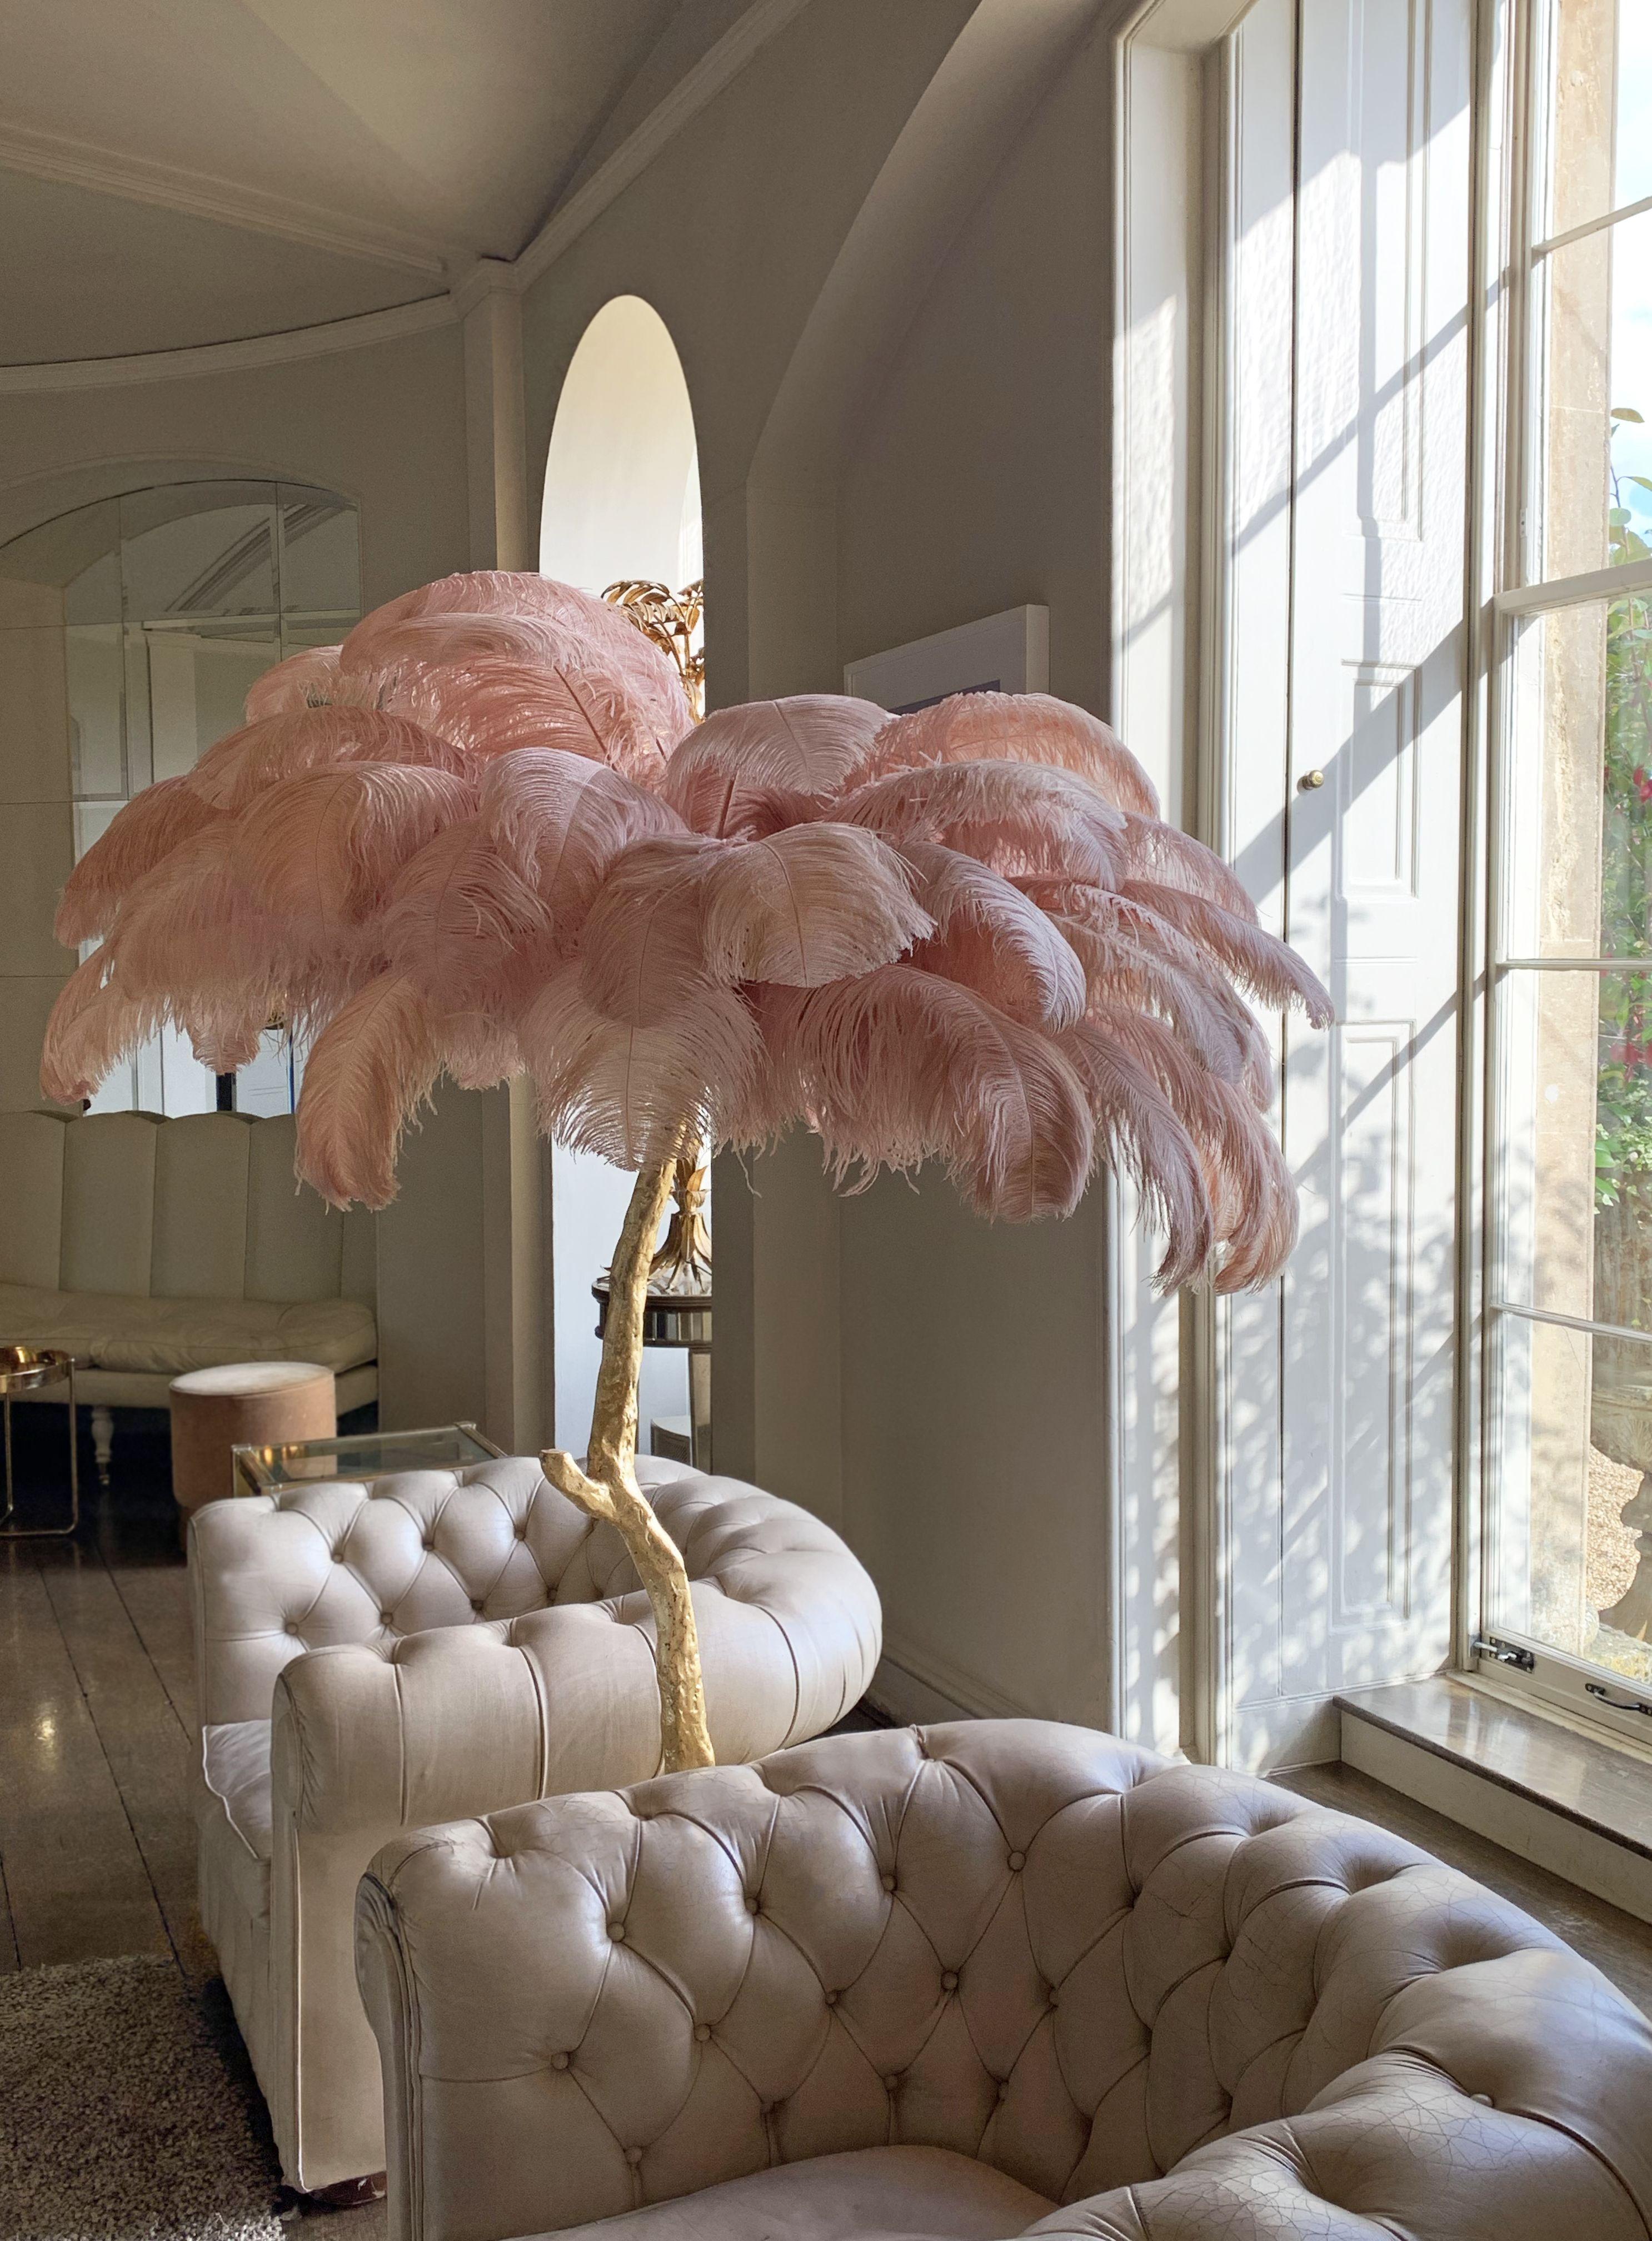 The Feather Floor Lamp in 8  Room design, Home decor, Salon